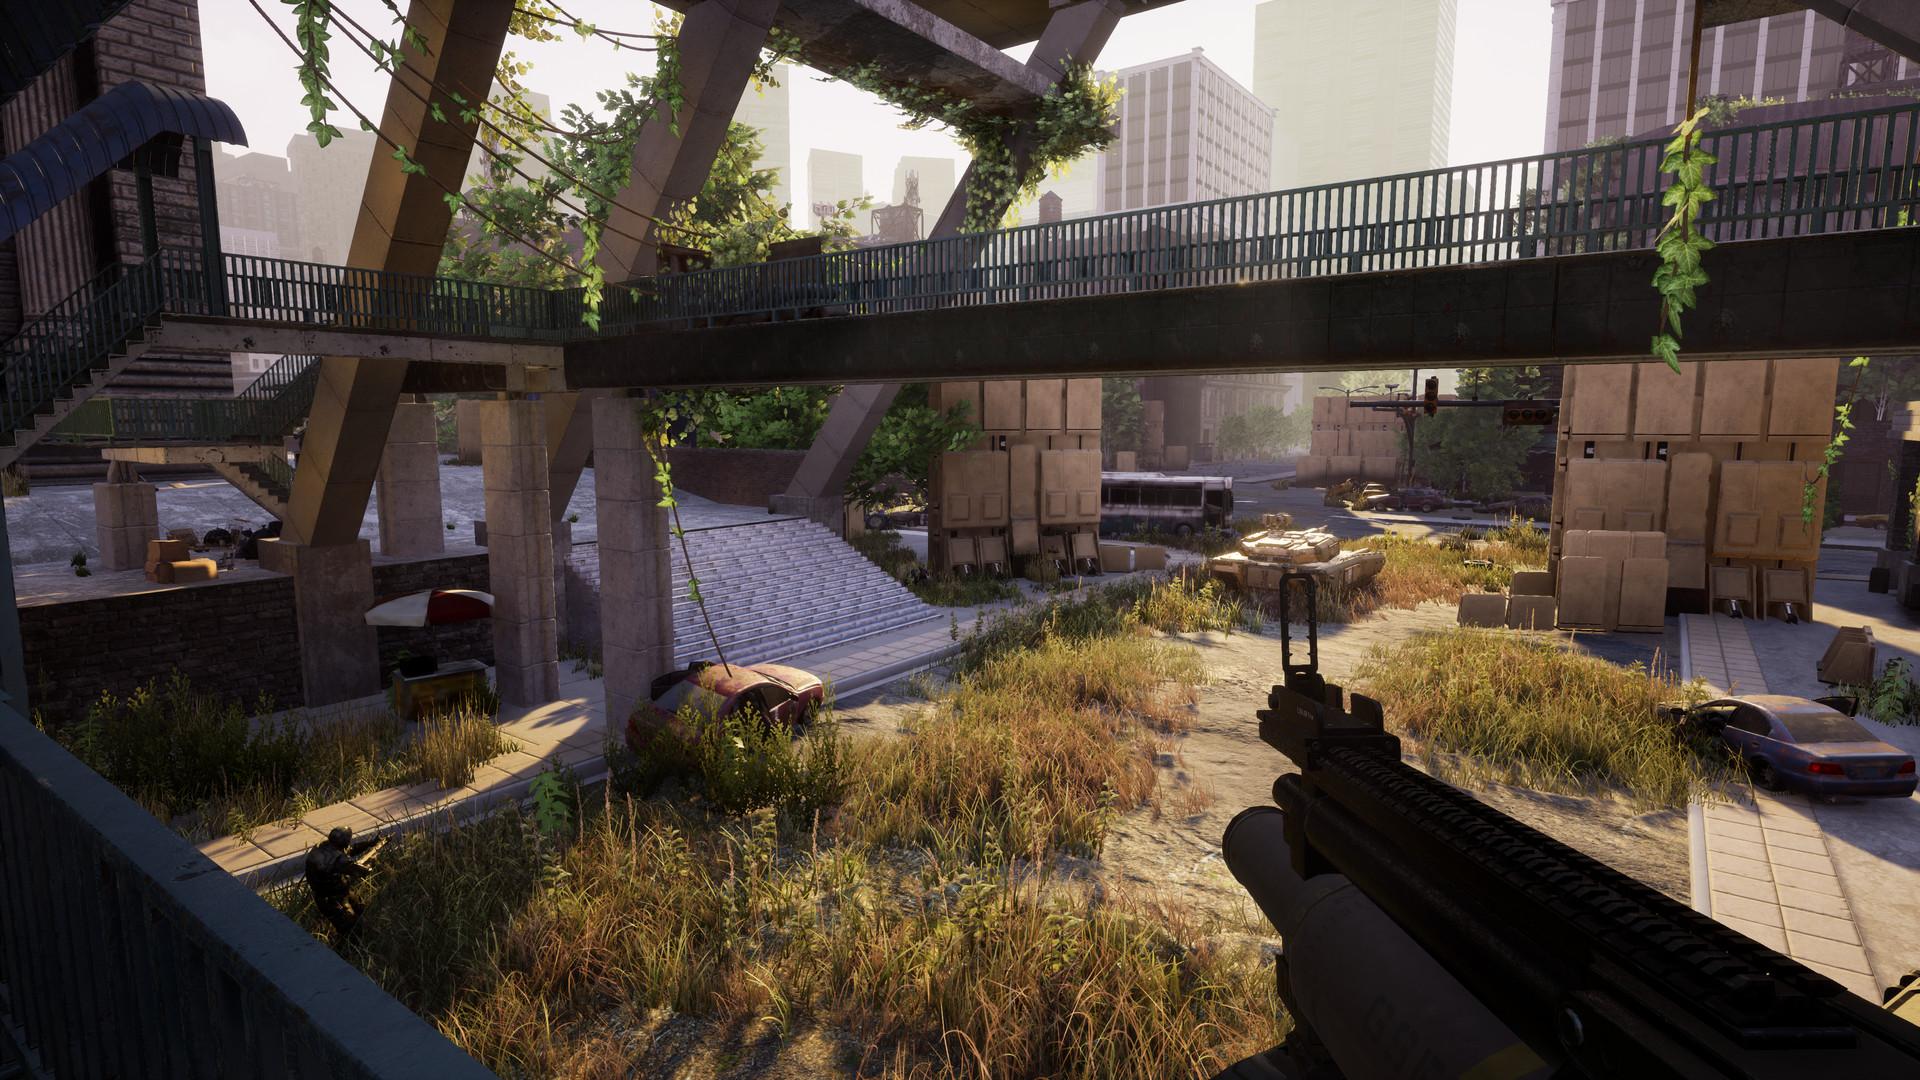 Call of Duty Black Ops 3 Skill baserade matchmaking stora dating rubriker exempel